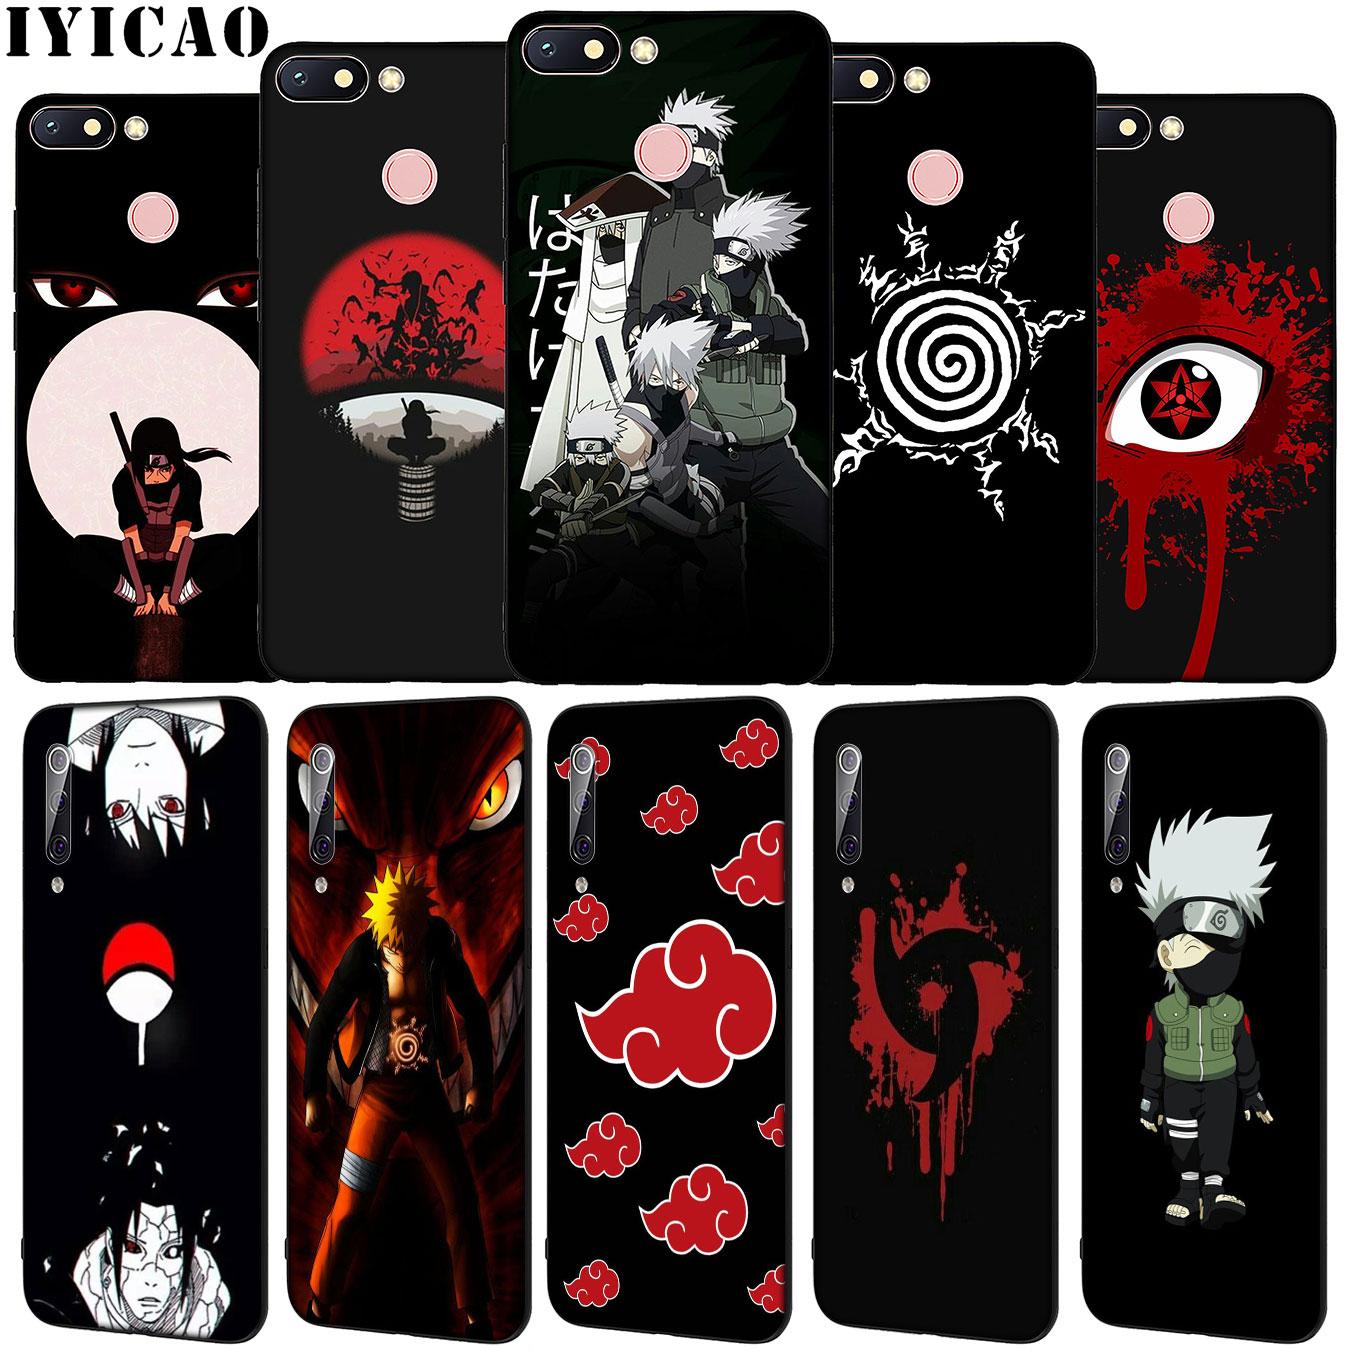 Naruto Uchiha Sasuke Anime Soft Silicone Phone Case for Xiaomi Redmi Note 8 8T 8A 7 7A 6 6A 5 5A GO S2 K30 K20 Pro Black Cover